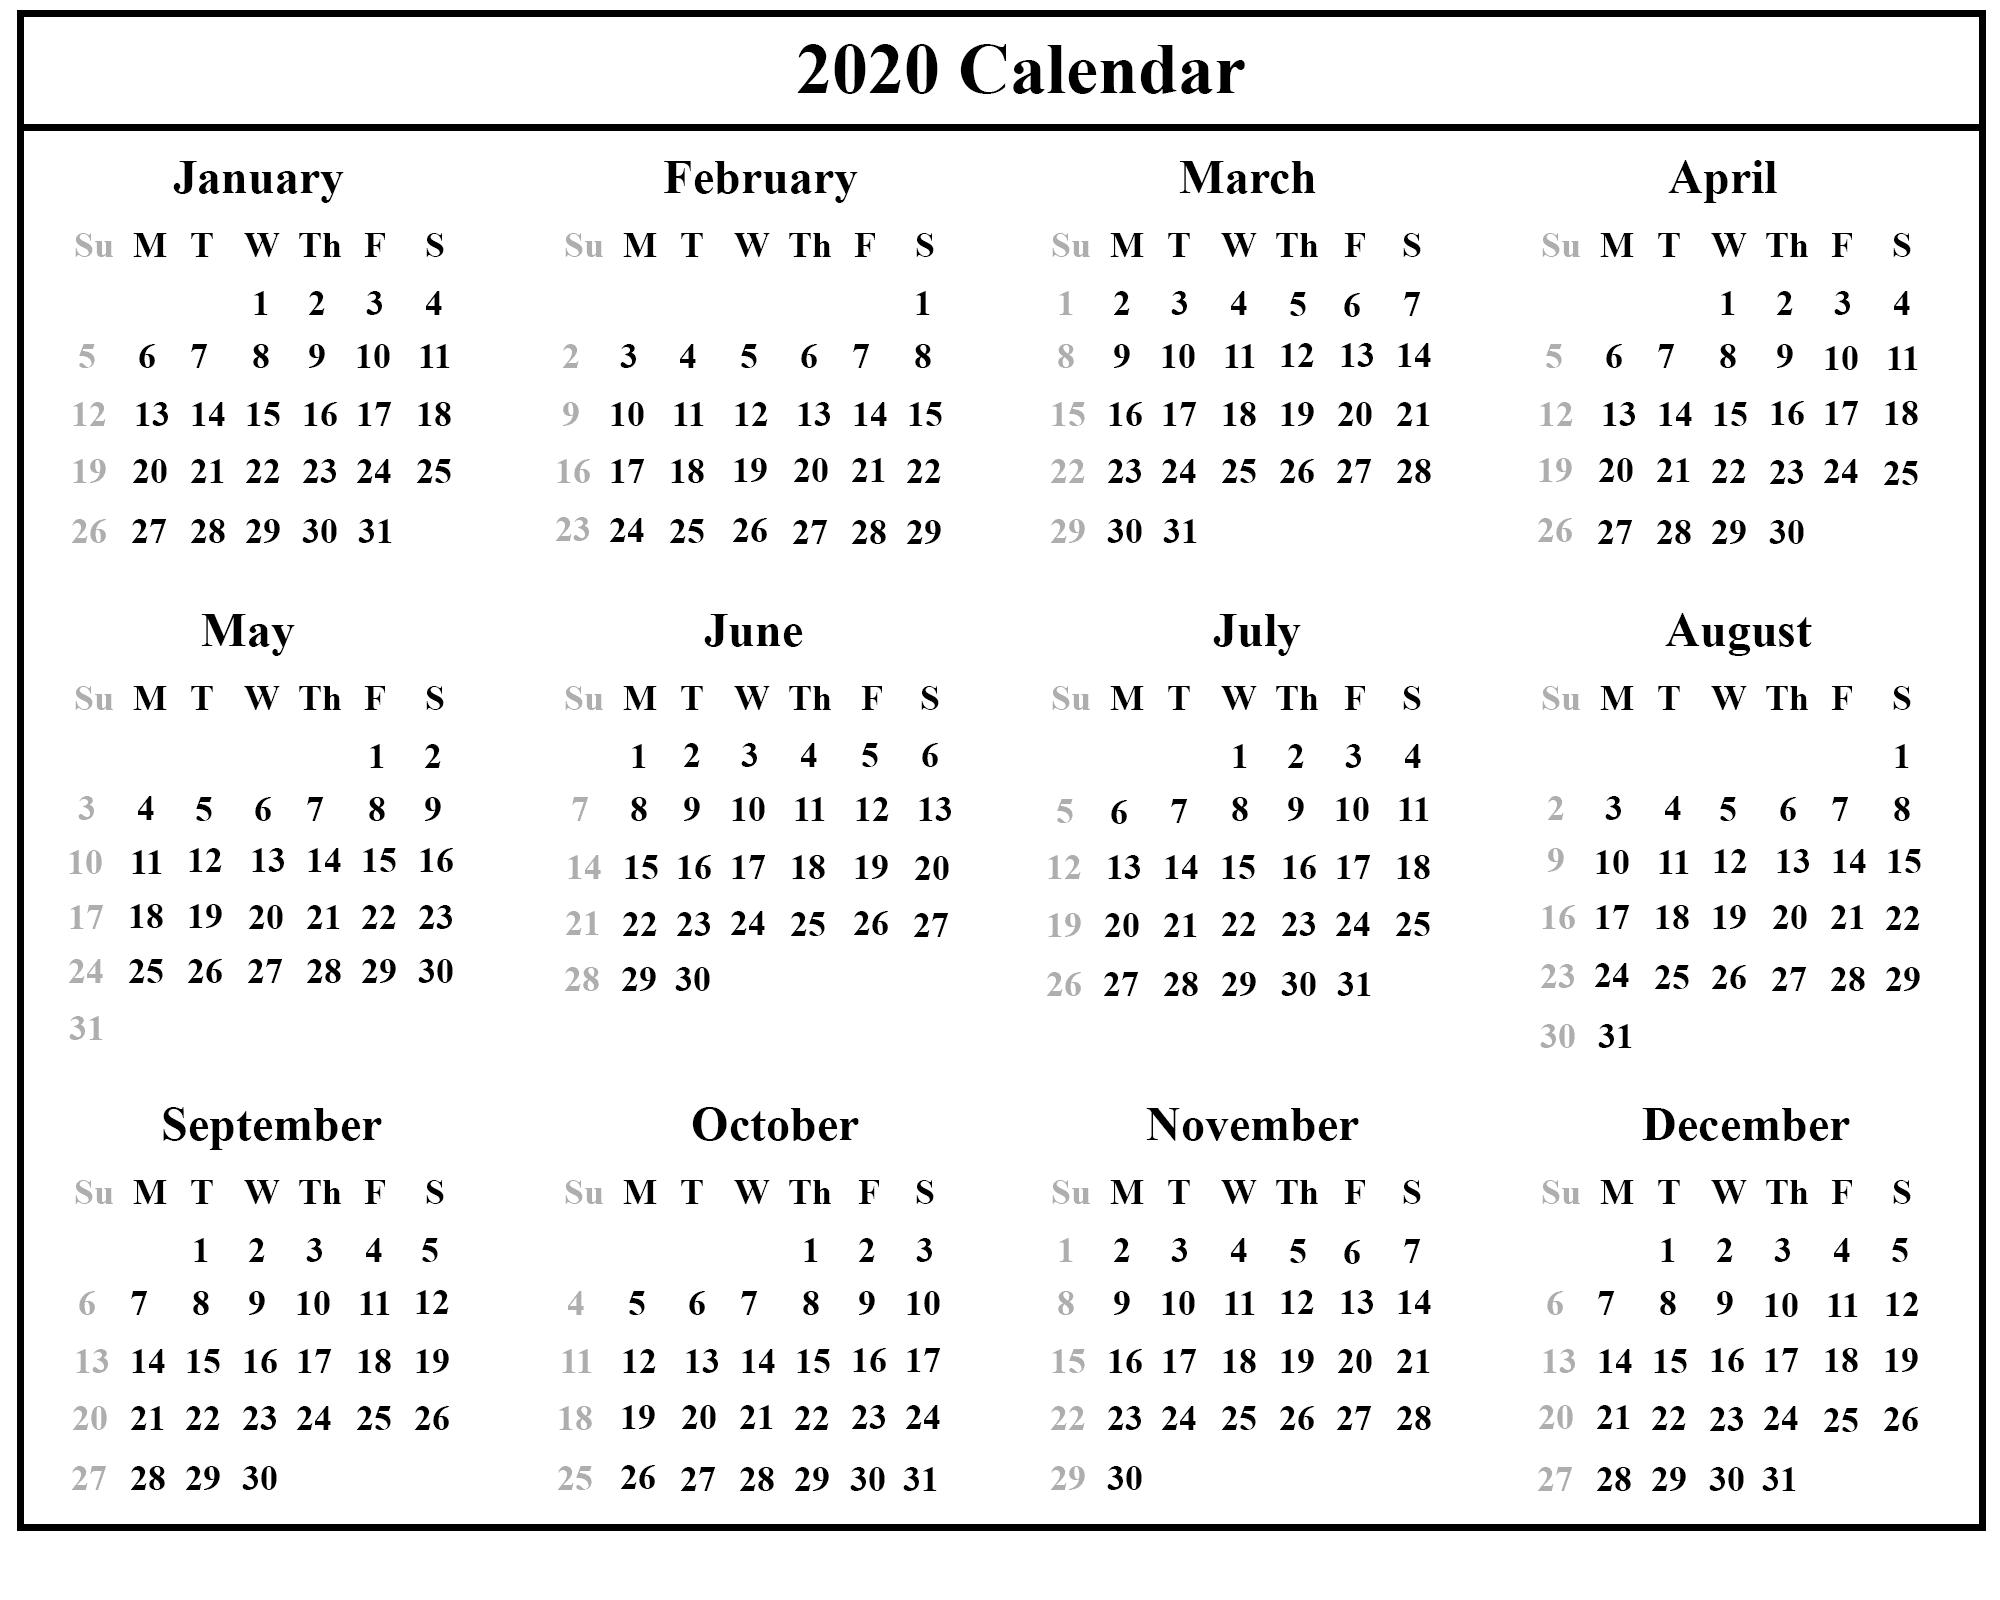 2020 Calendar Blank Template